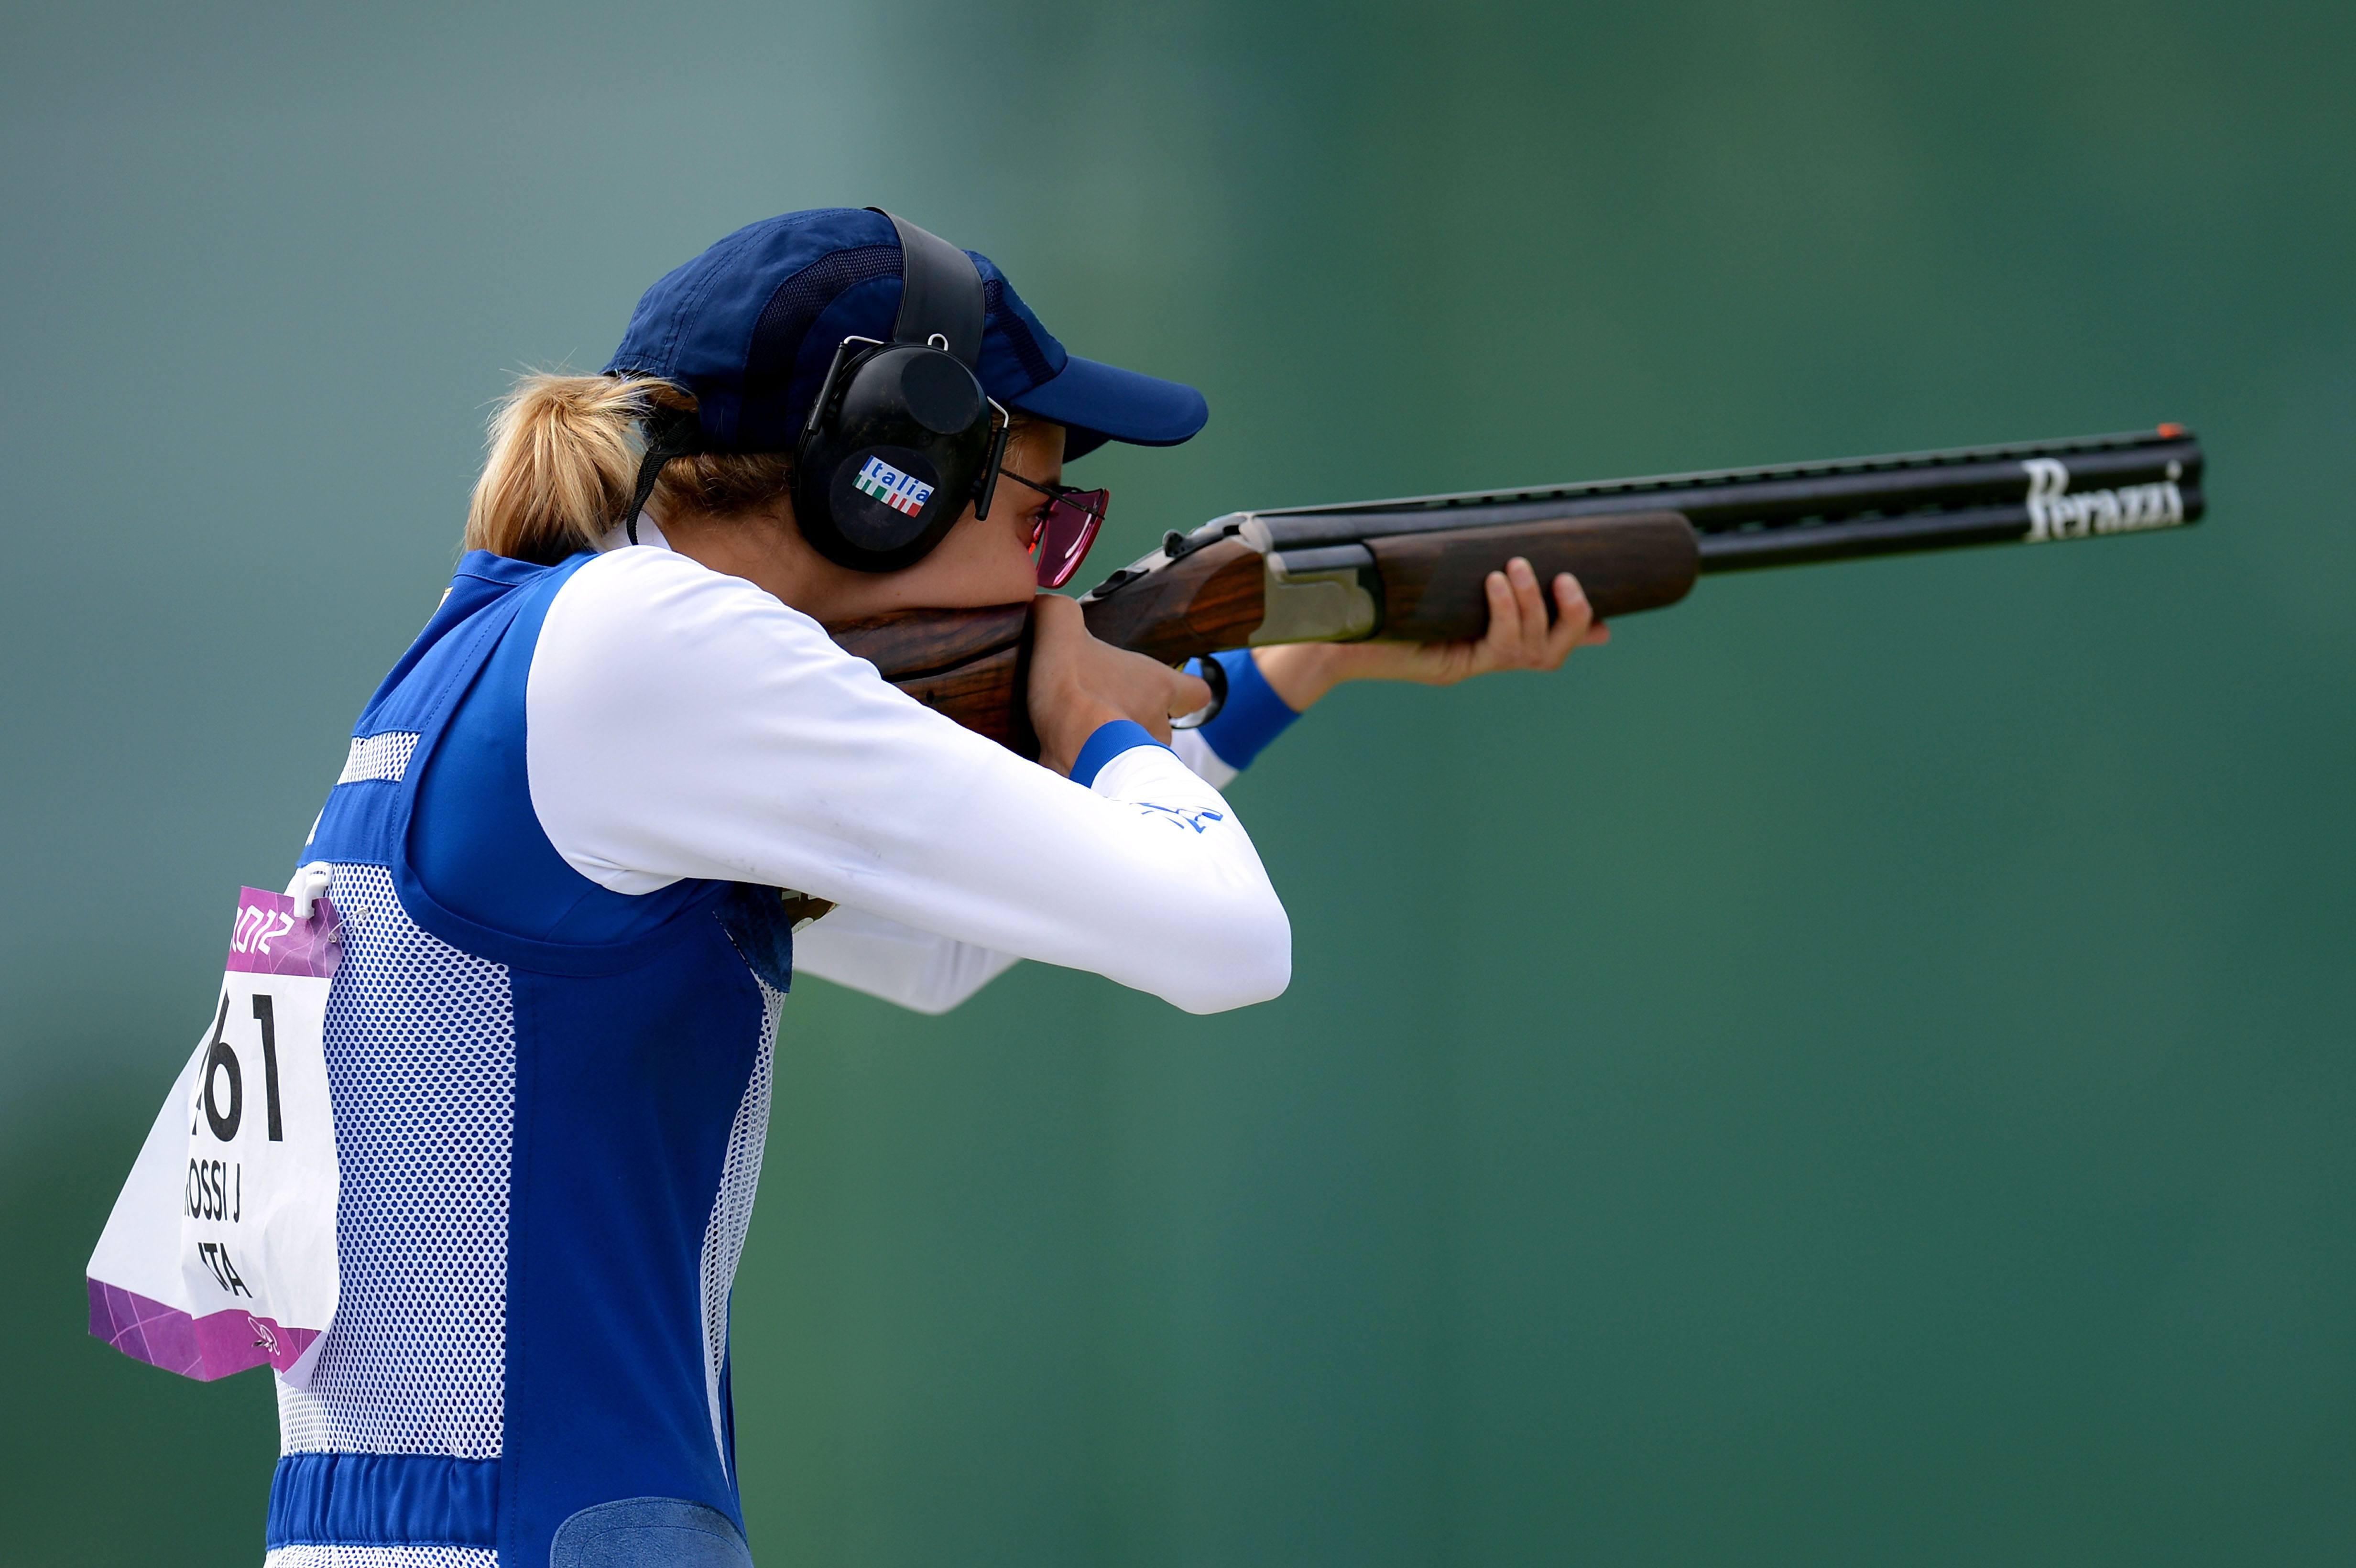 Girl shooting a gun during the olympics